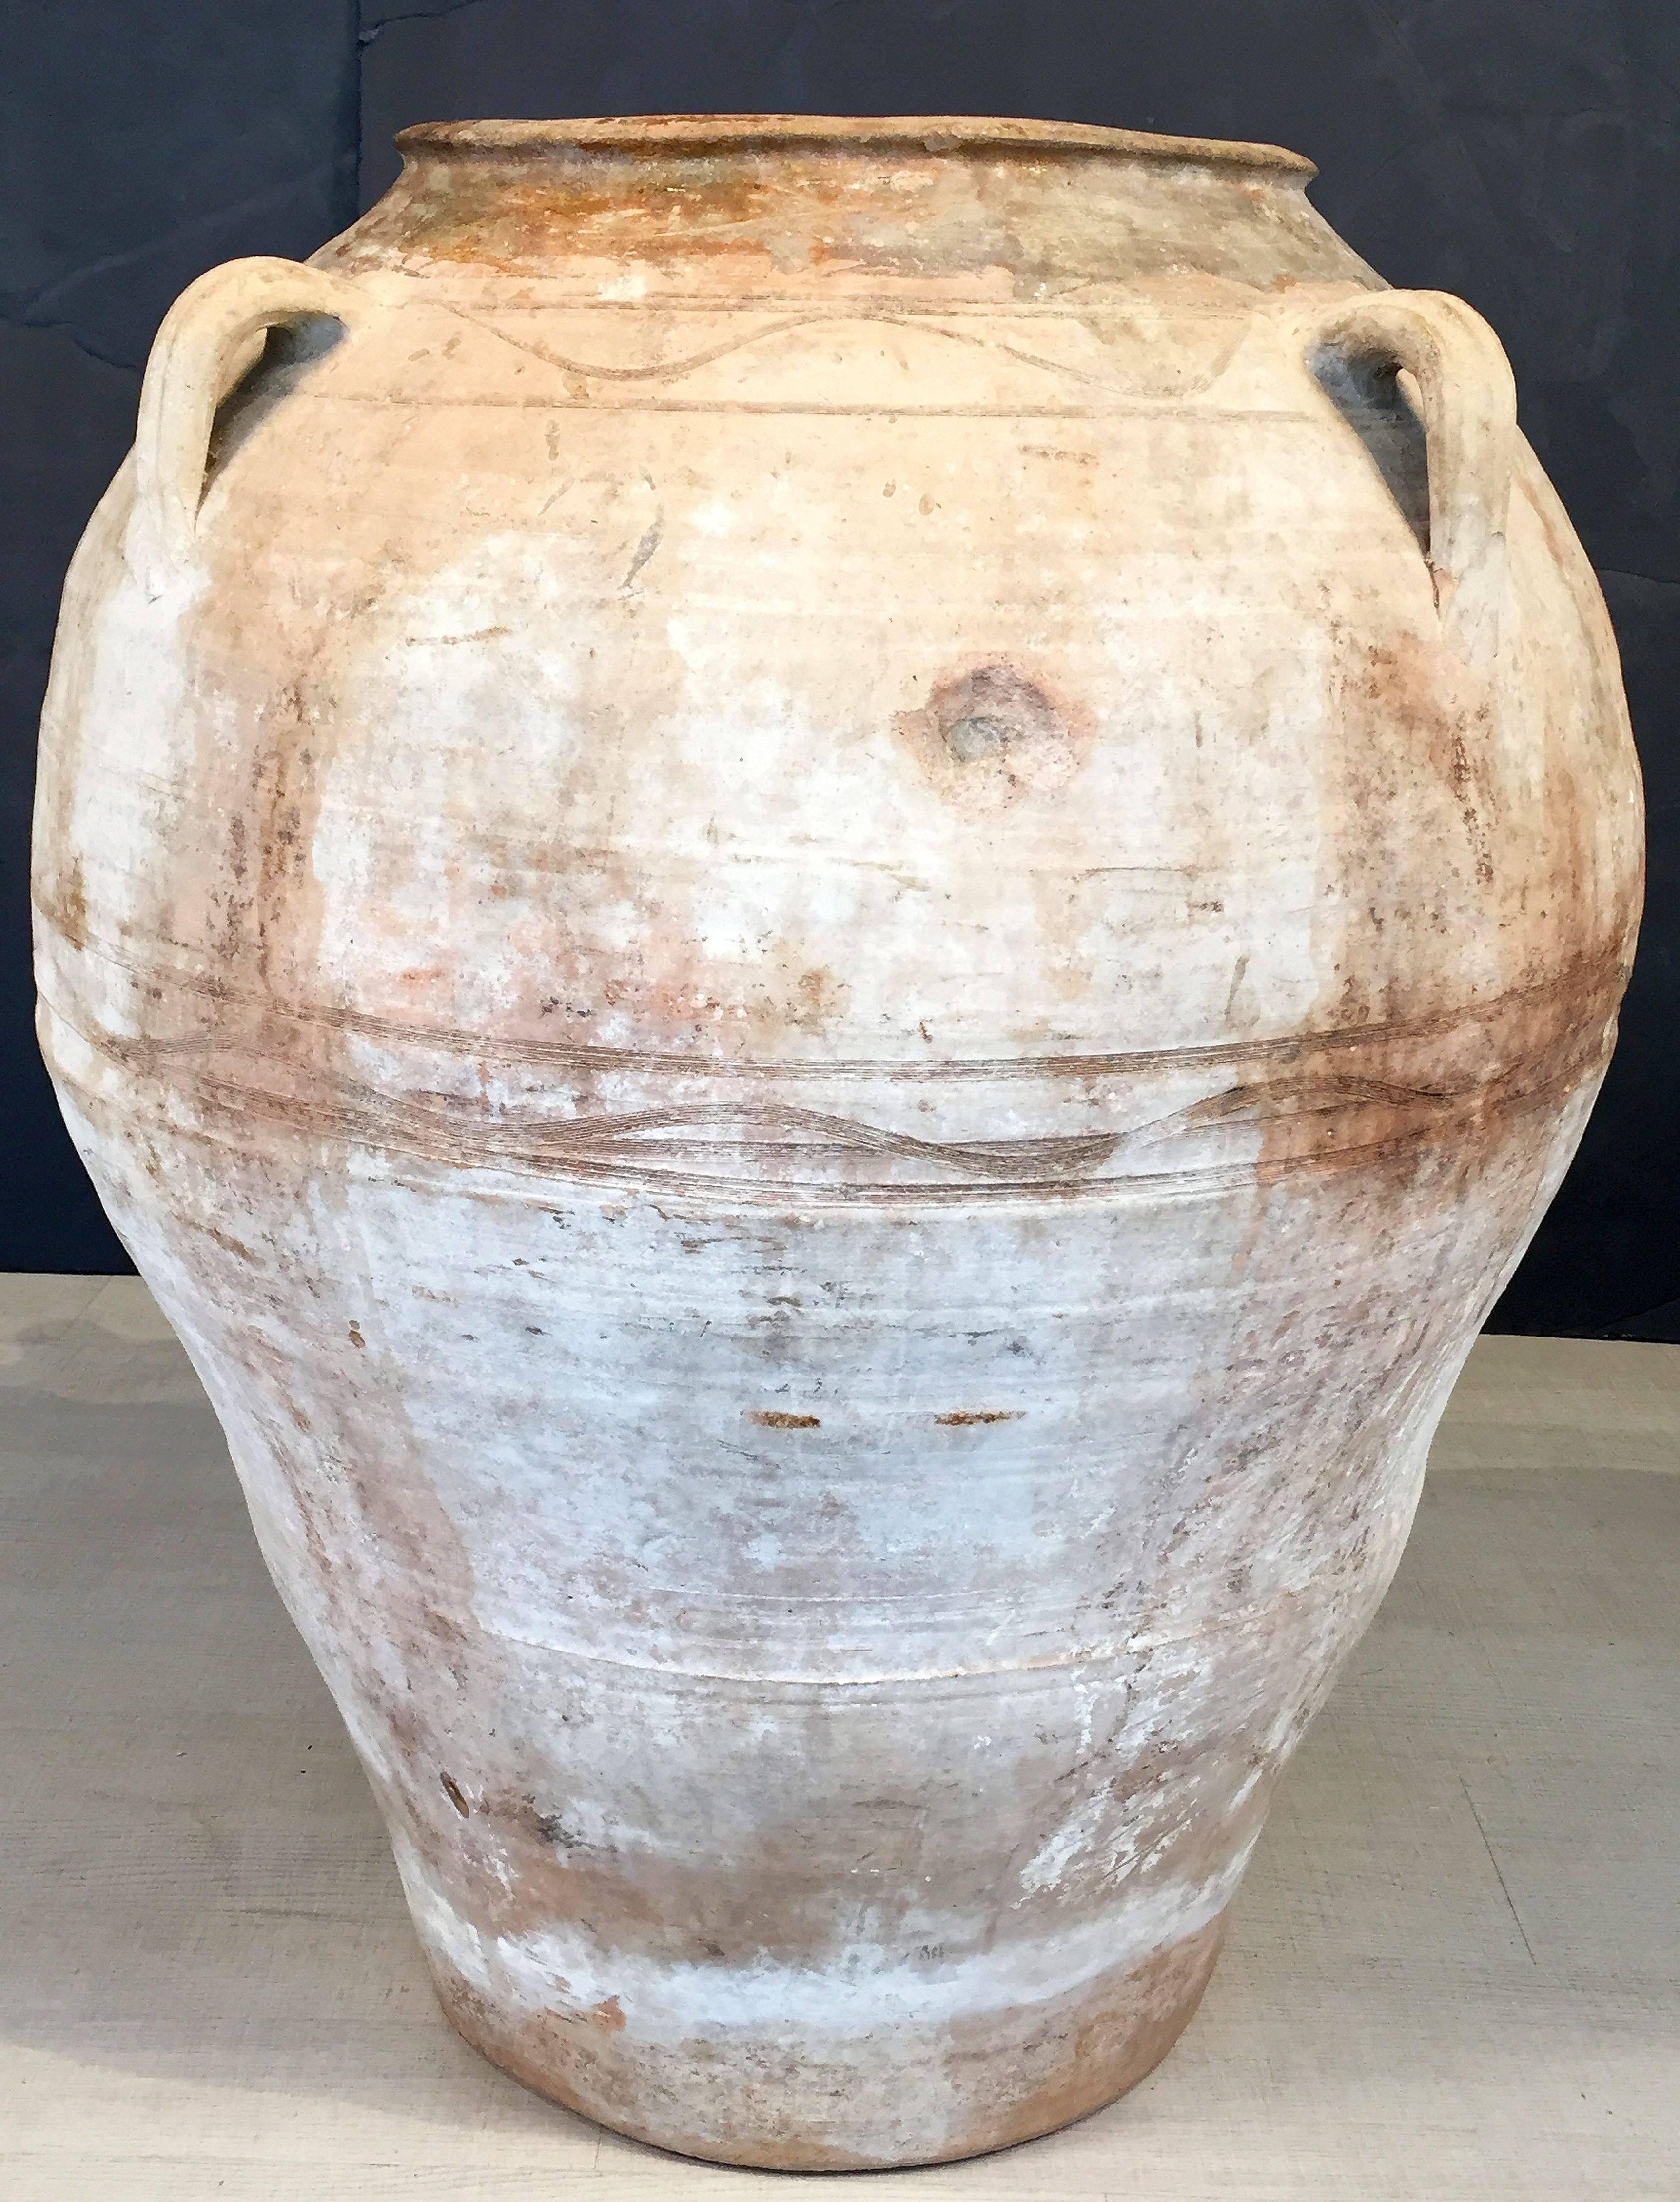 Glazed Large Garden Urn Or Oil Jar From Spain For Sale